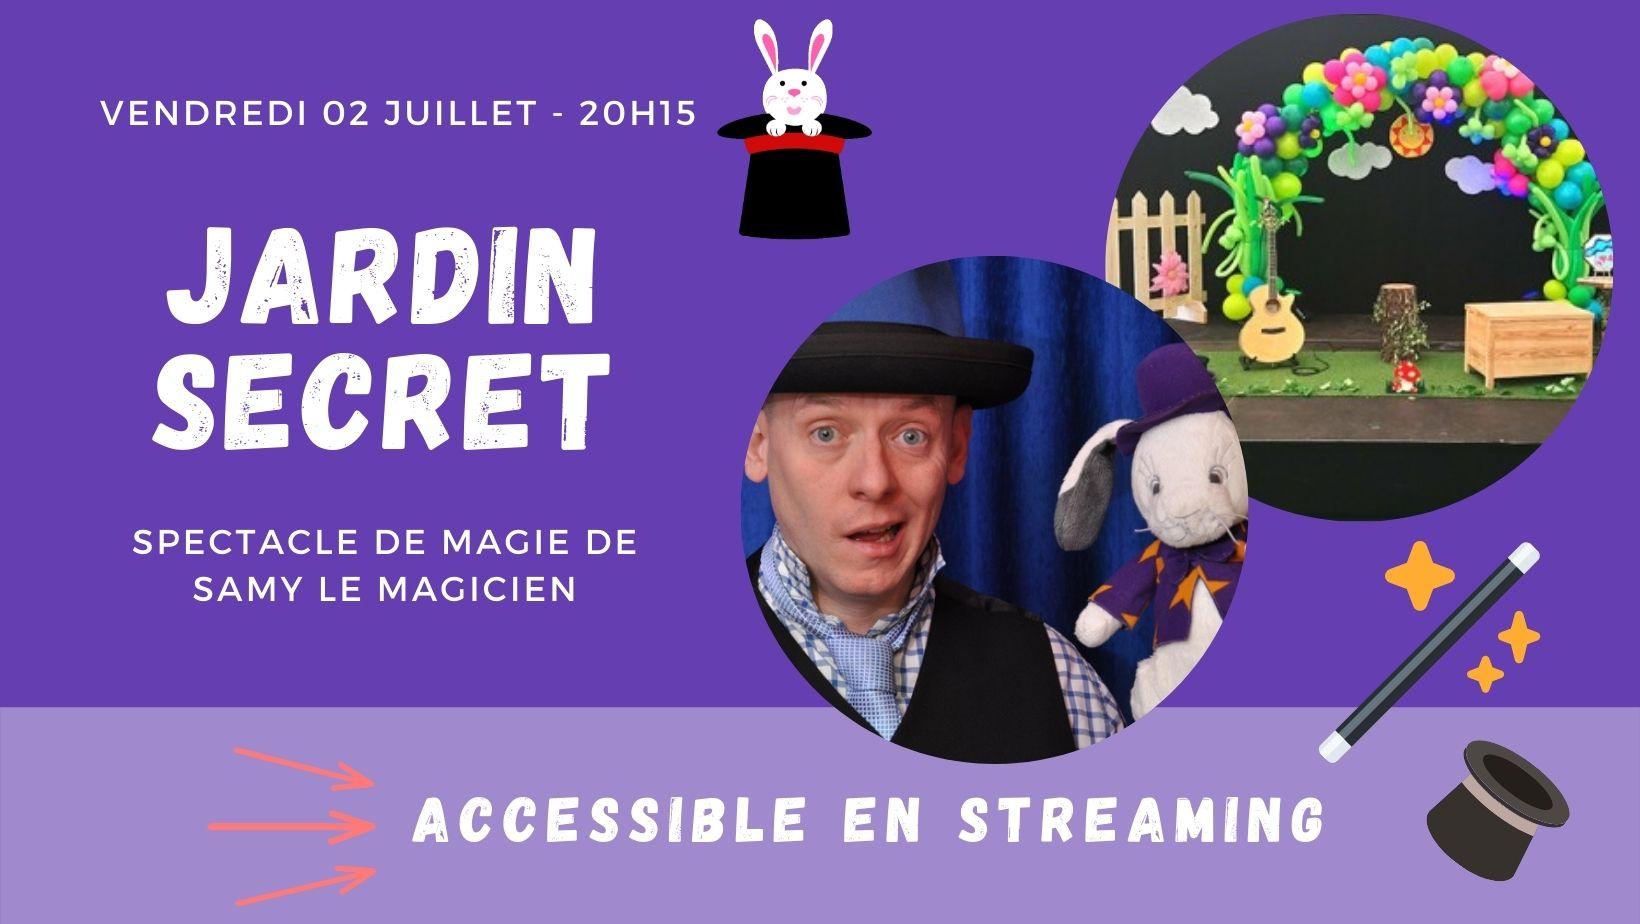 Jardin secret - Samy le magicien